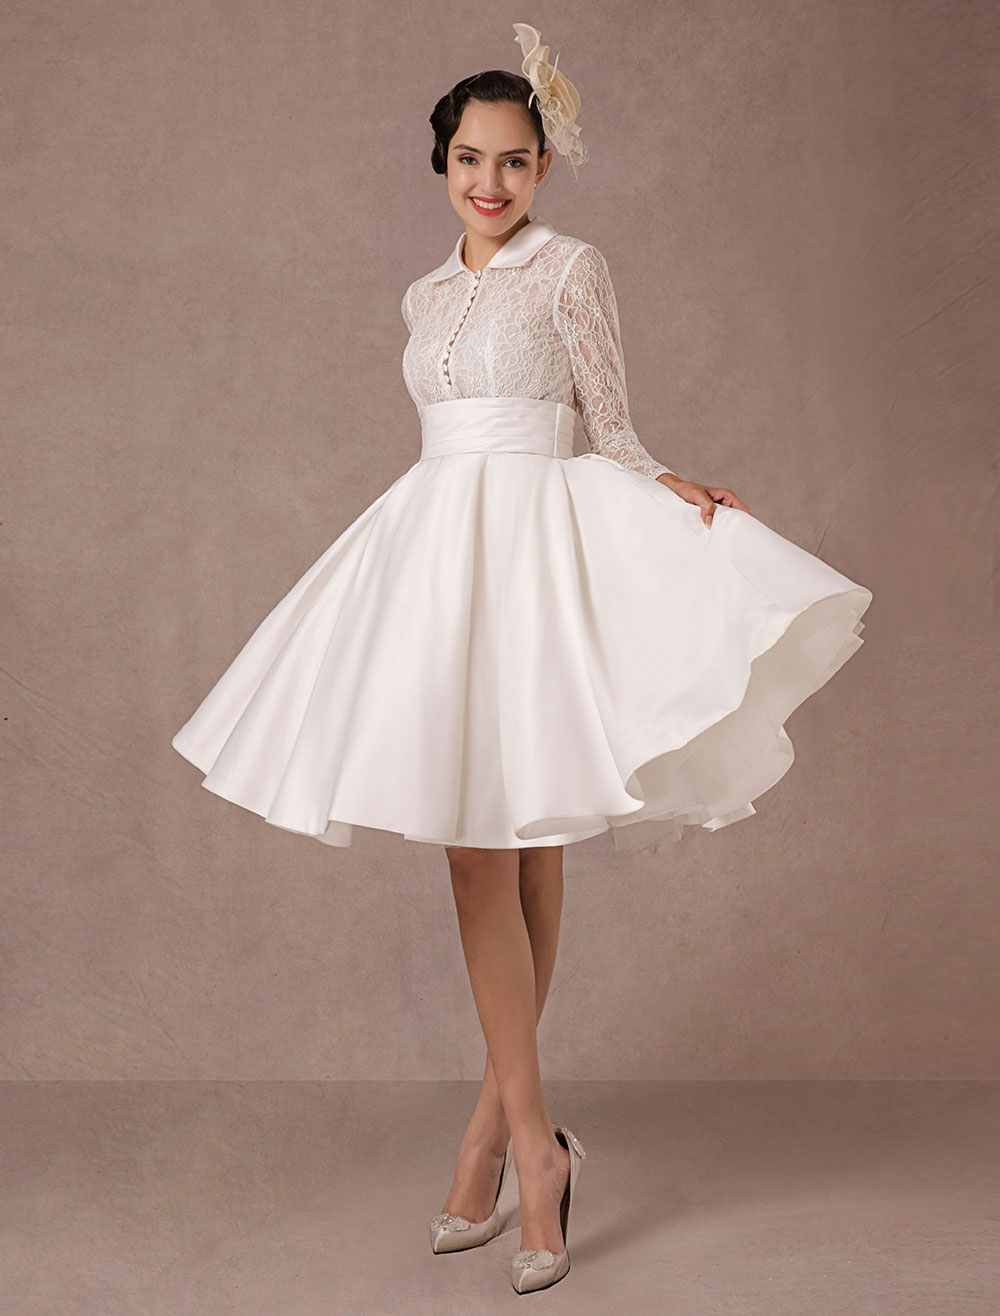 Vintage Wedding Dress Long Lace Sleeves Satin Bridal Gown Short Knee Length Summer Wedding Dresses 2018 Milanoo (Lace Wedding Dress) photo